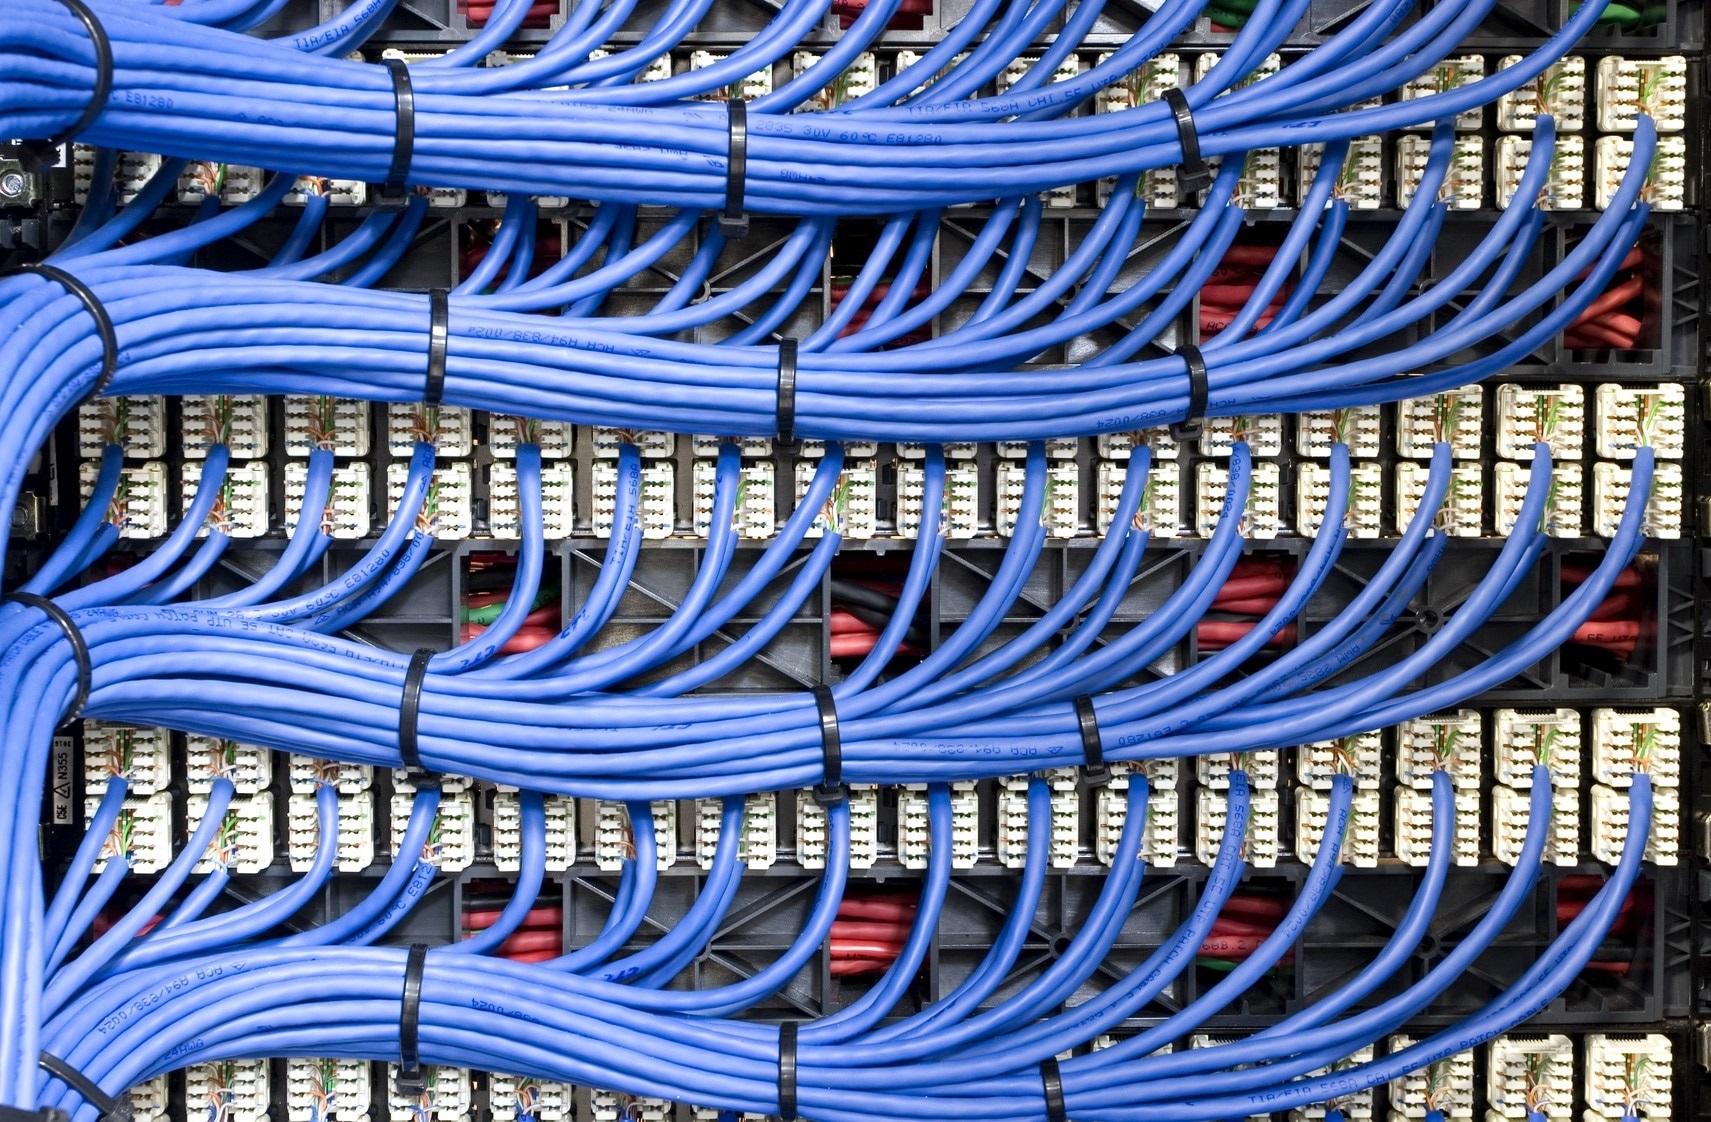 Network-Cabling.jpg